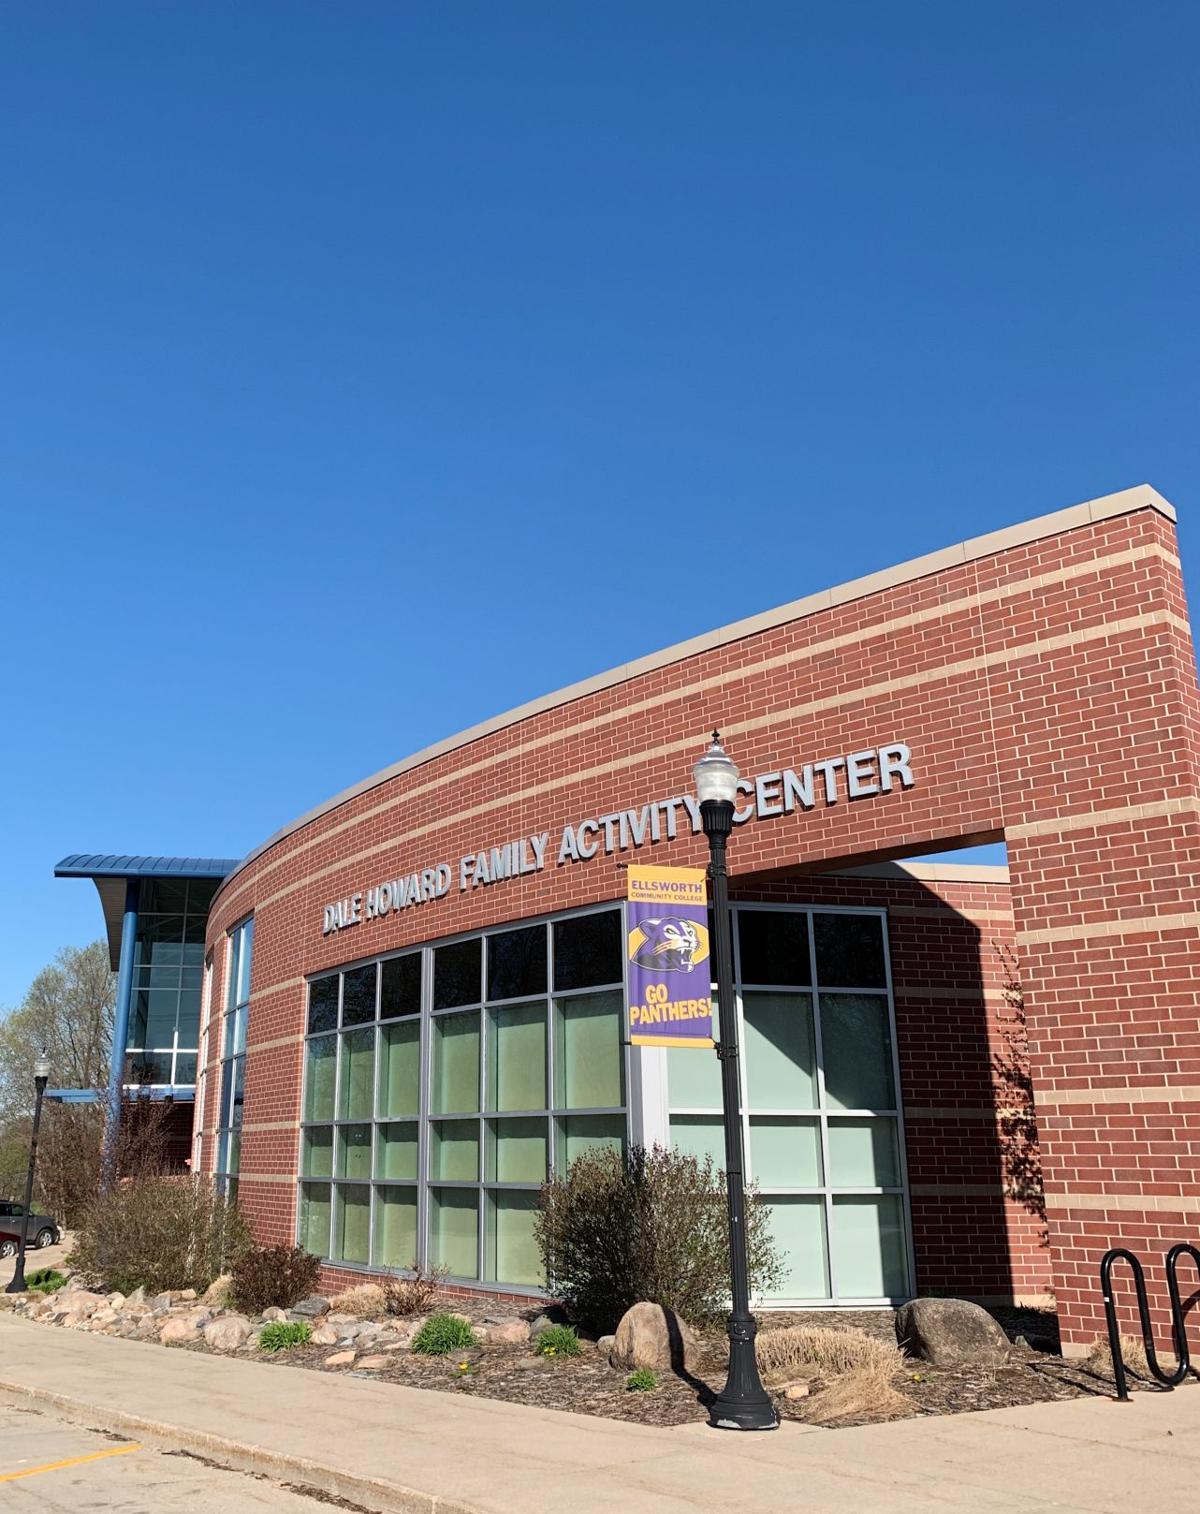 Dale Howard Family Activity Center